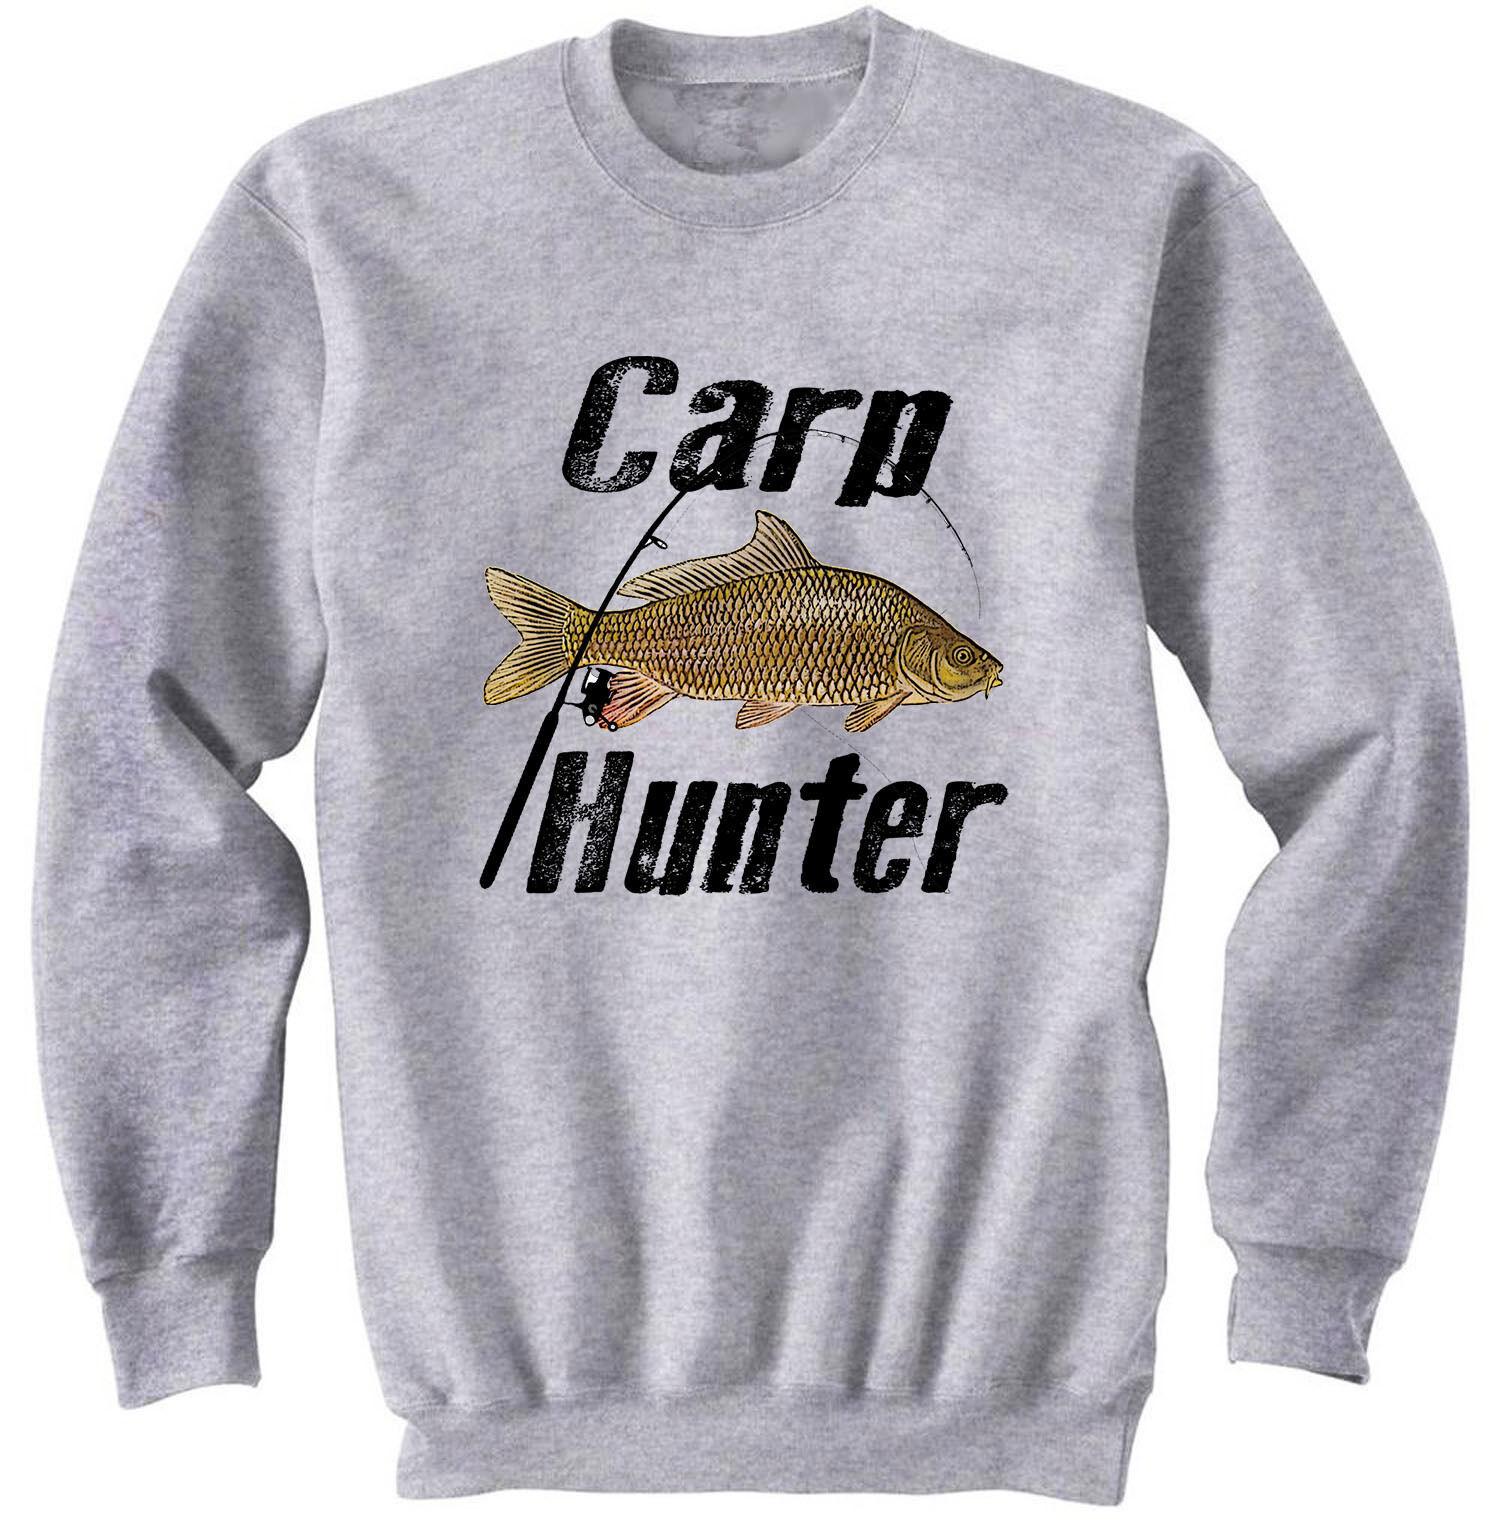 CARP HUNTER - NEW COTTON GREY SWEATSHIRT - $31.88